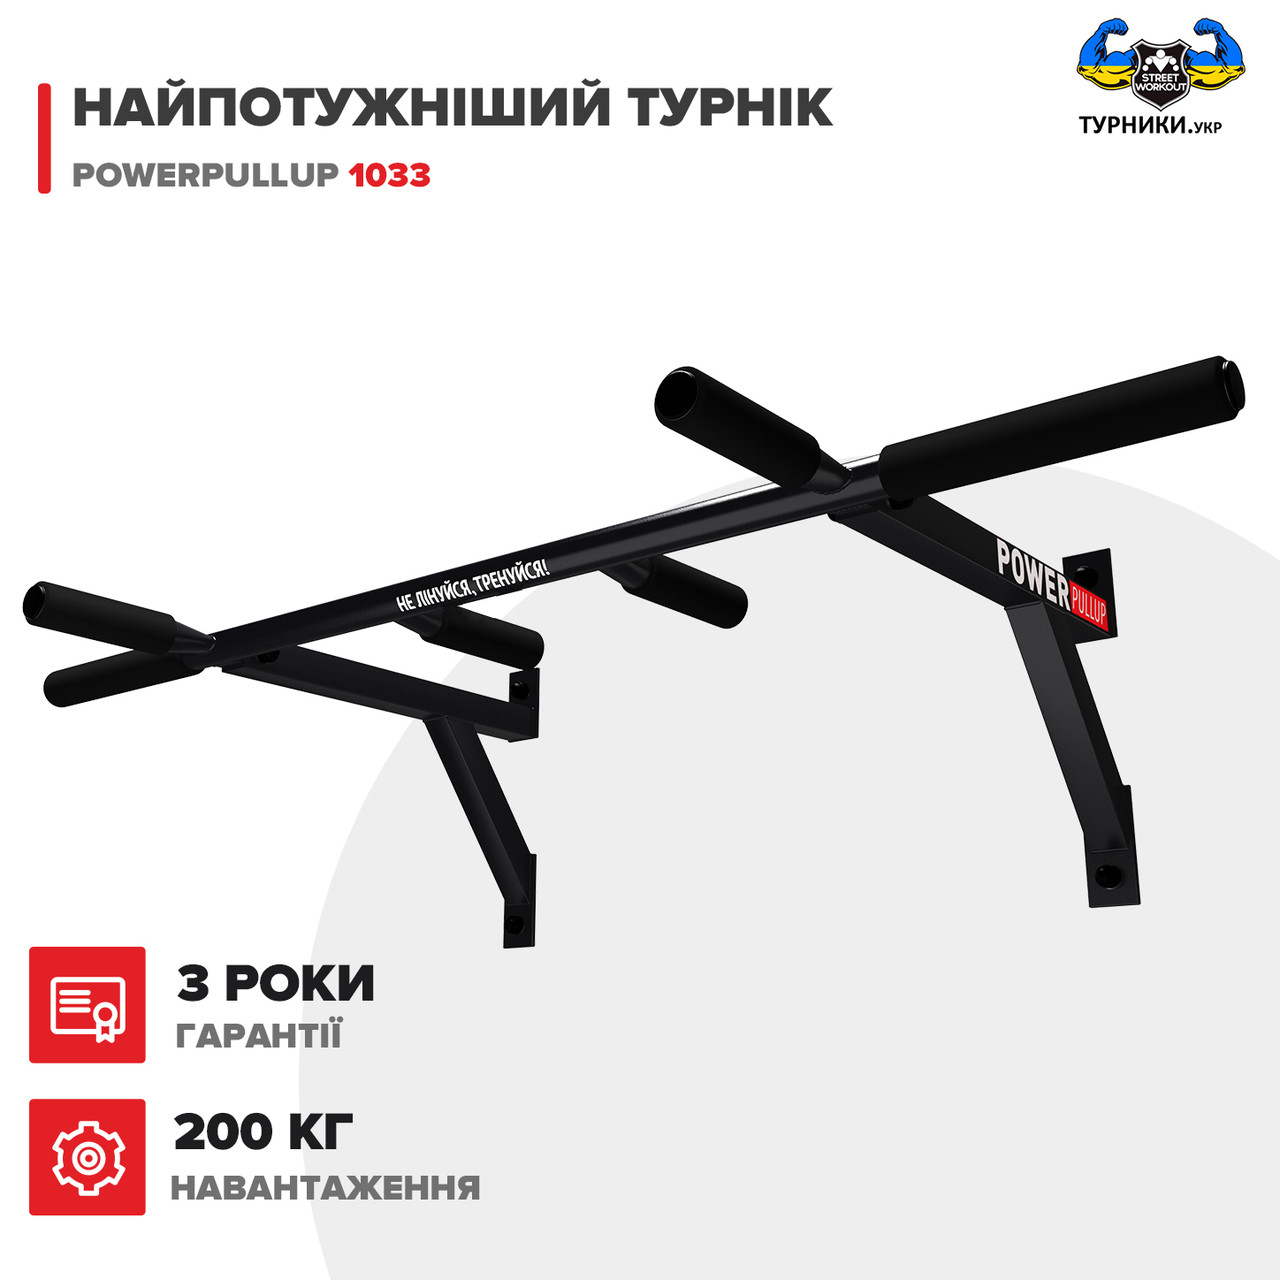 Турник настенный PowerPullup 1033 - 4 ХВАТА! черный